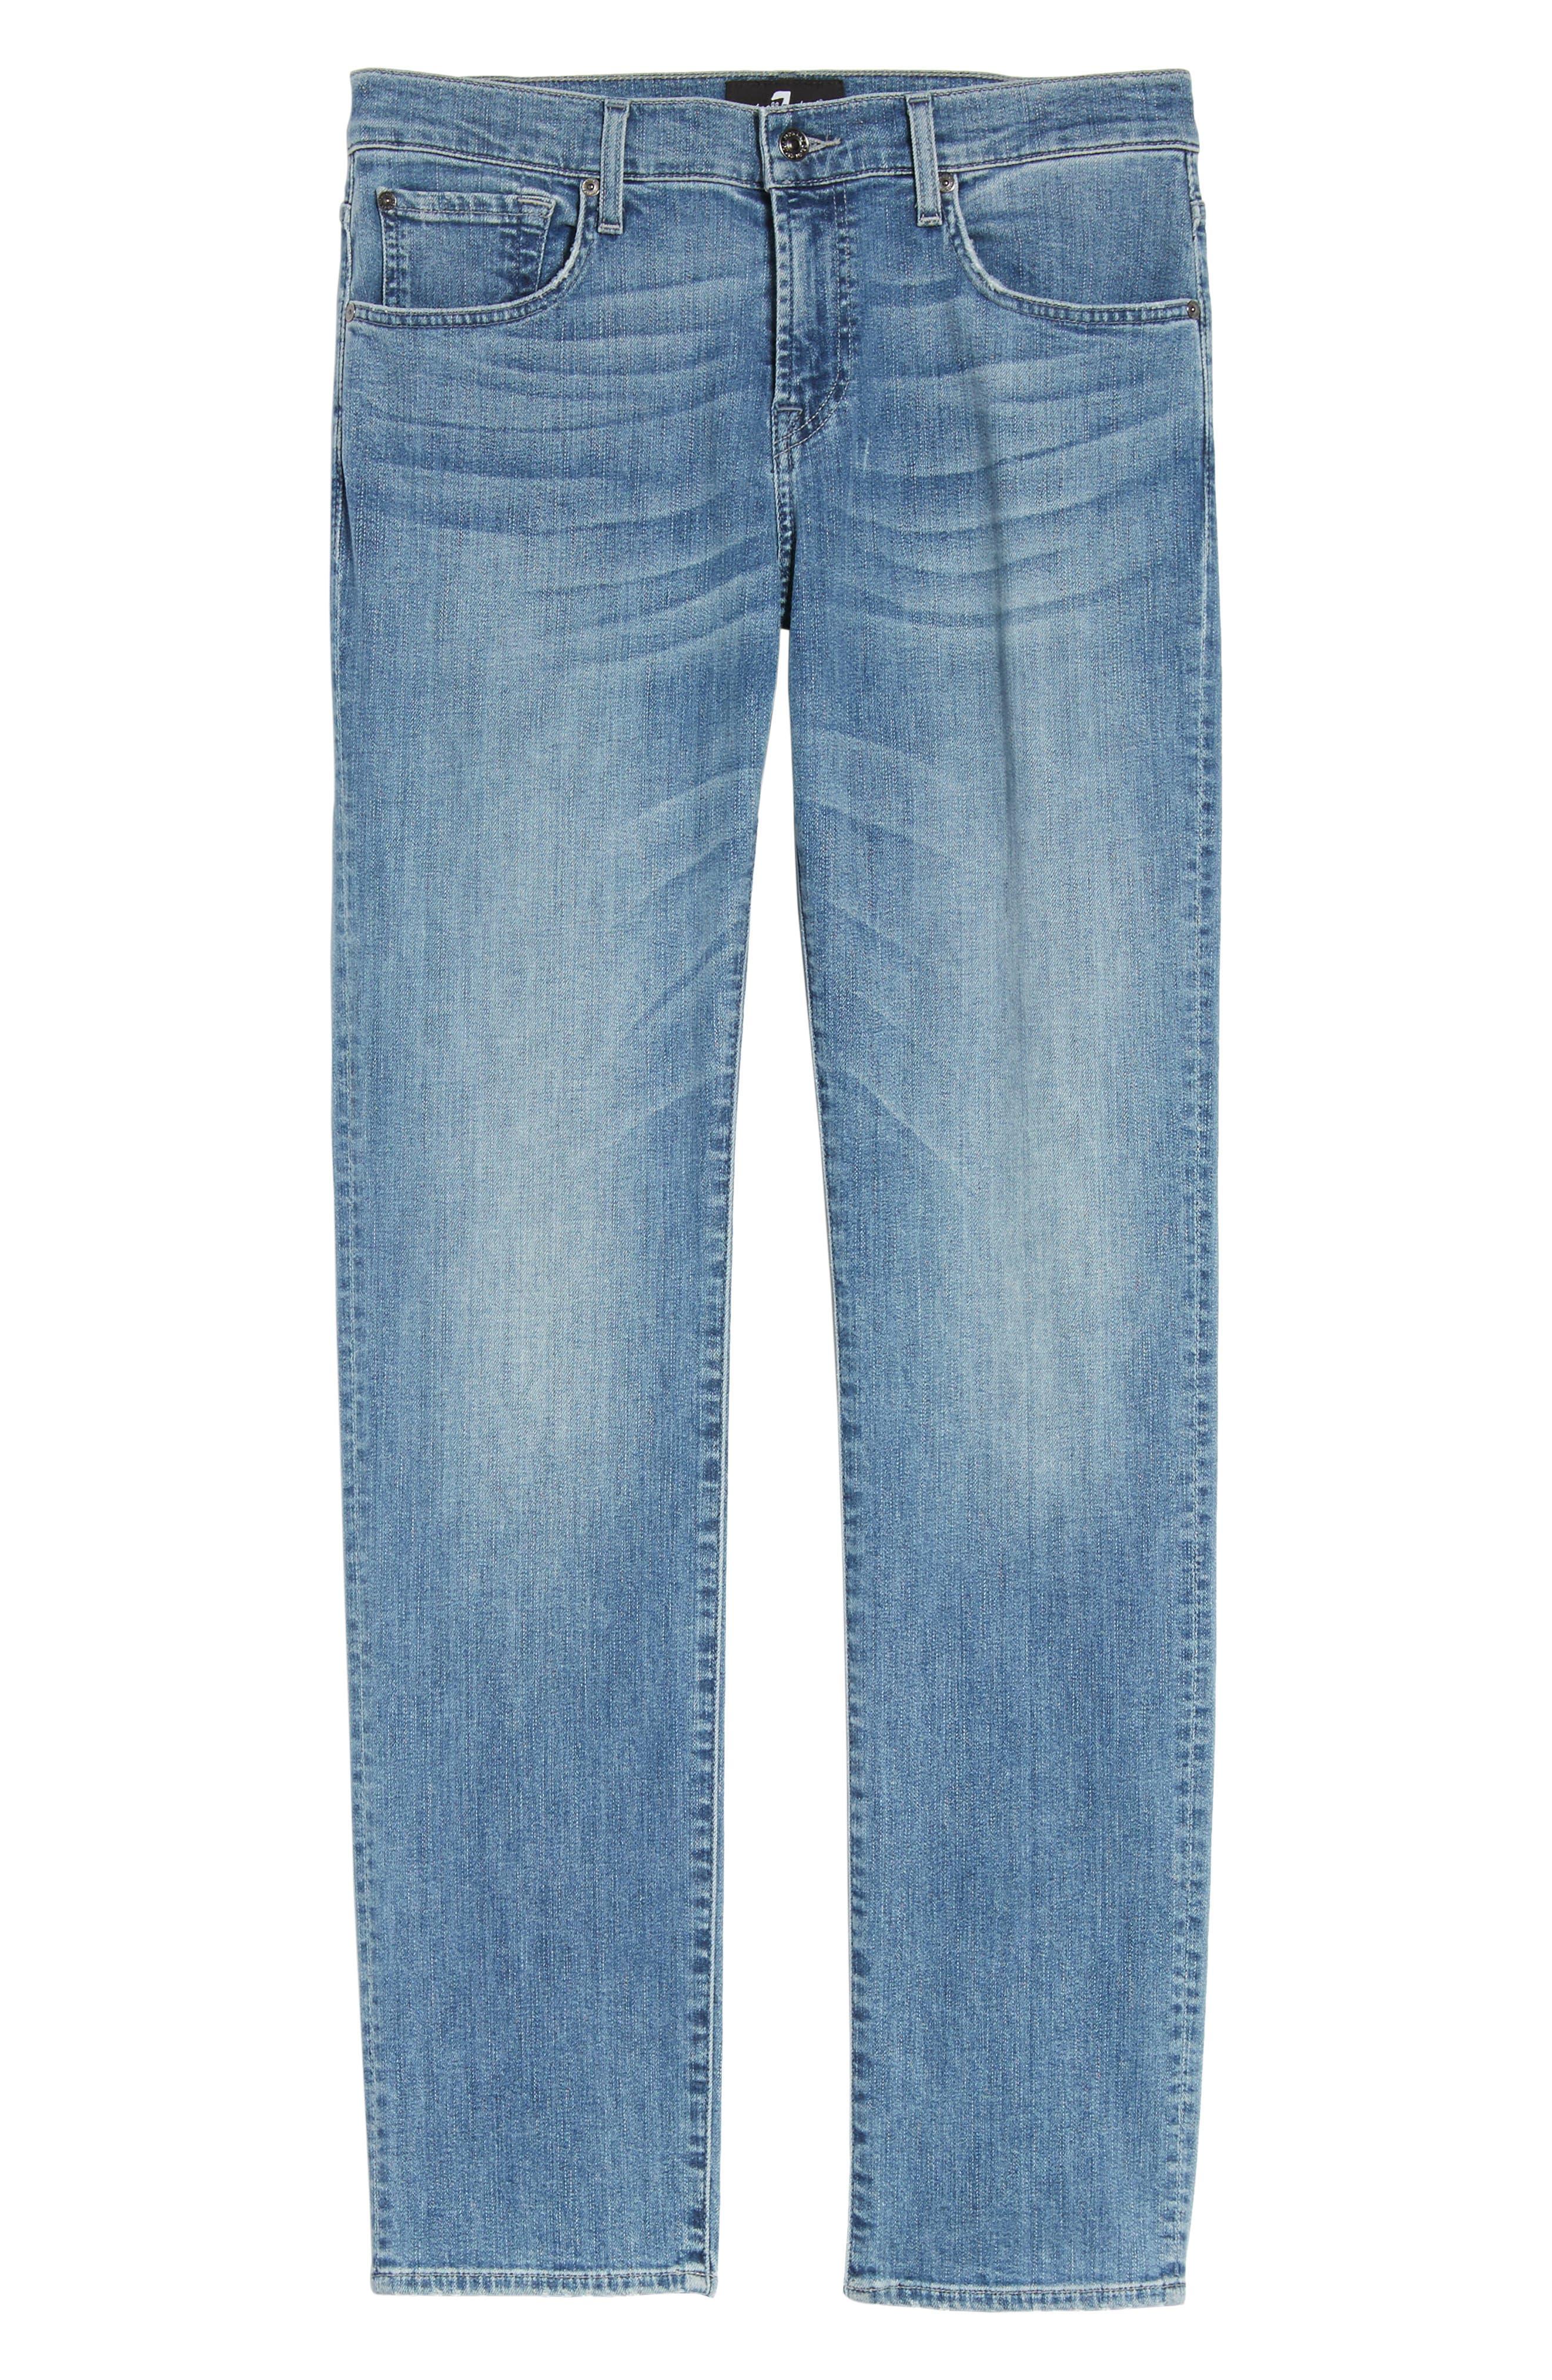 7 For All Mankind Slim Straight Leg Jeans,                             Alternate thumbnail 6, color,                             400